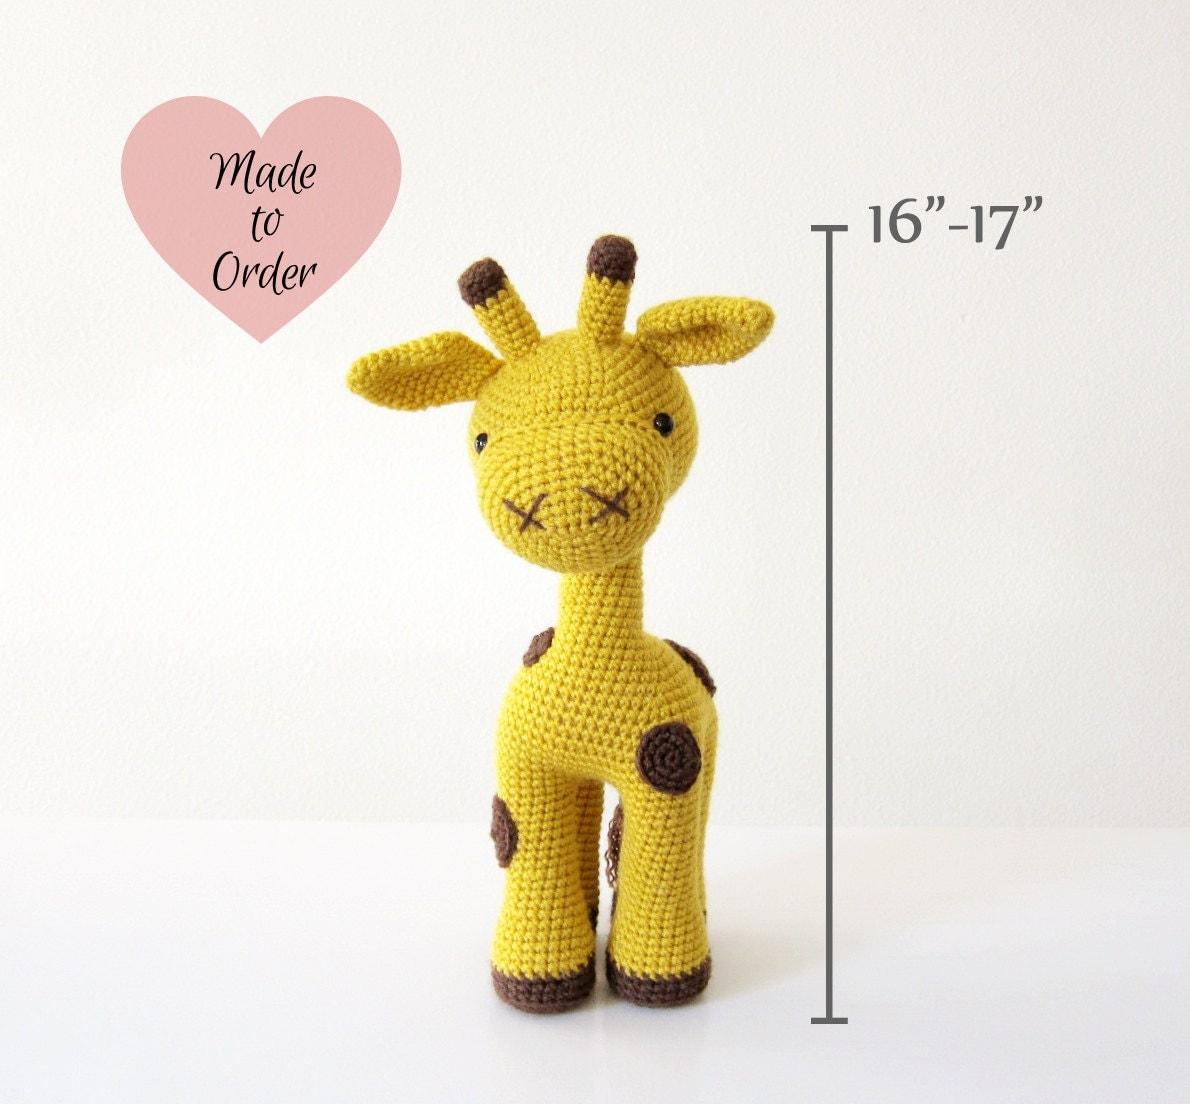 Cuddly Amigurumi Giraffe : MADE TO ORDER: Amigurumi Giraffe Crochet Stuffed Toy